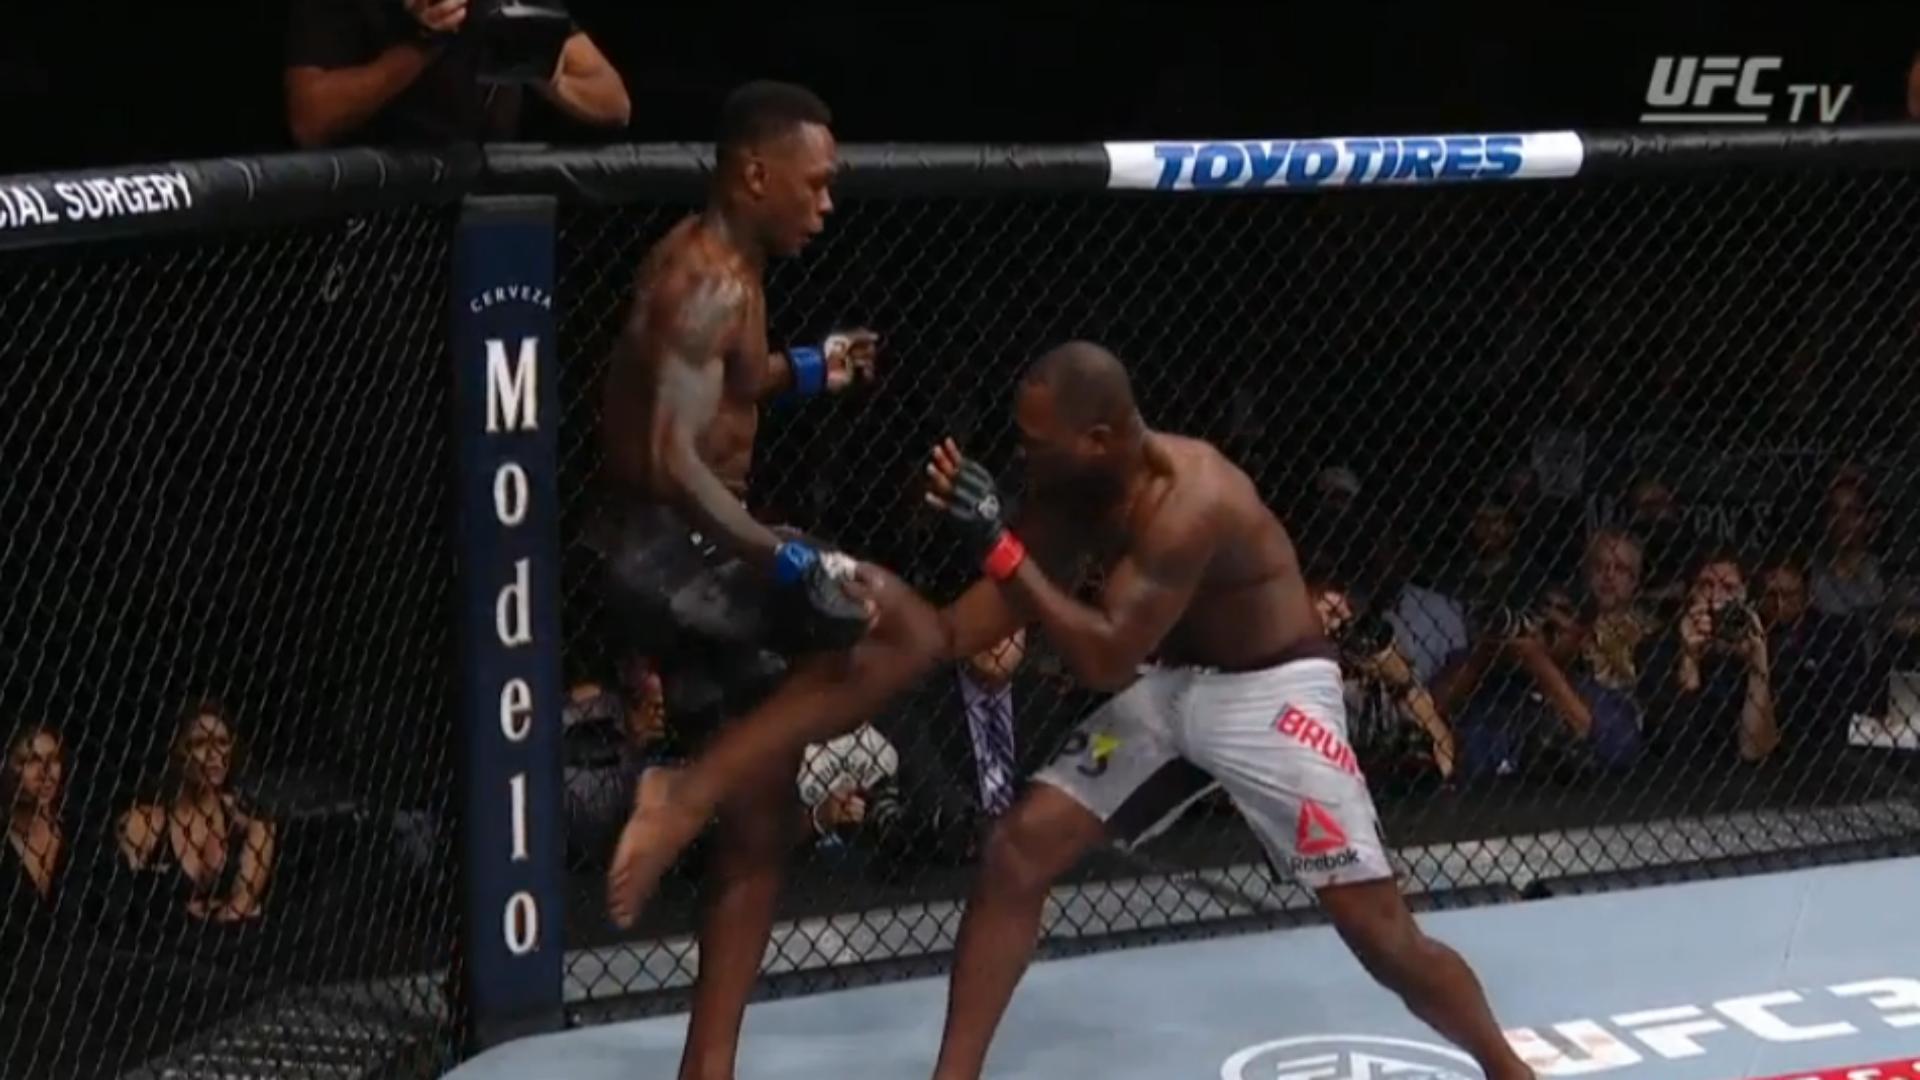 UFC 230 Israel Adesanya knocks out Derek Brunson in another